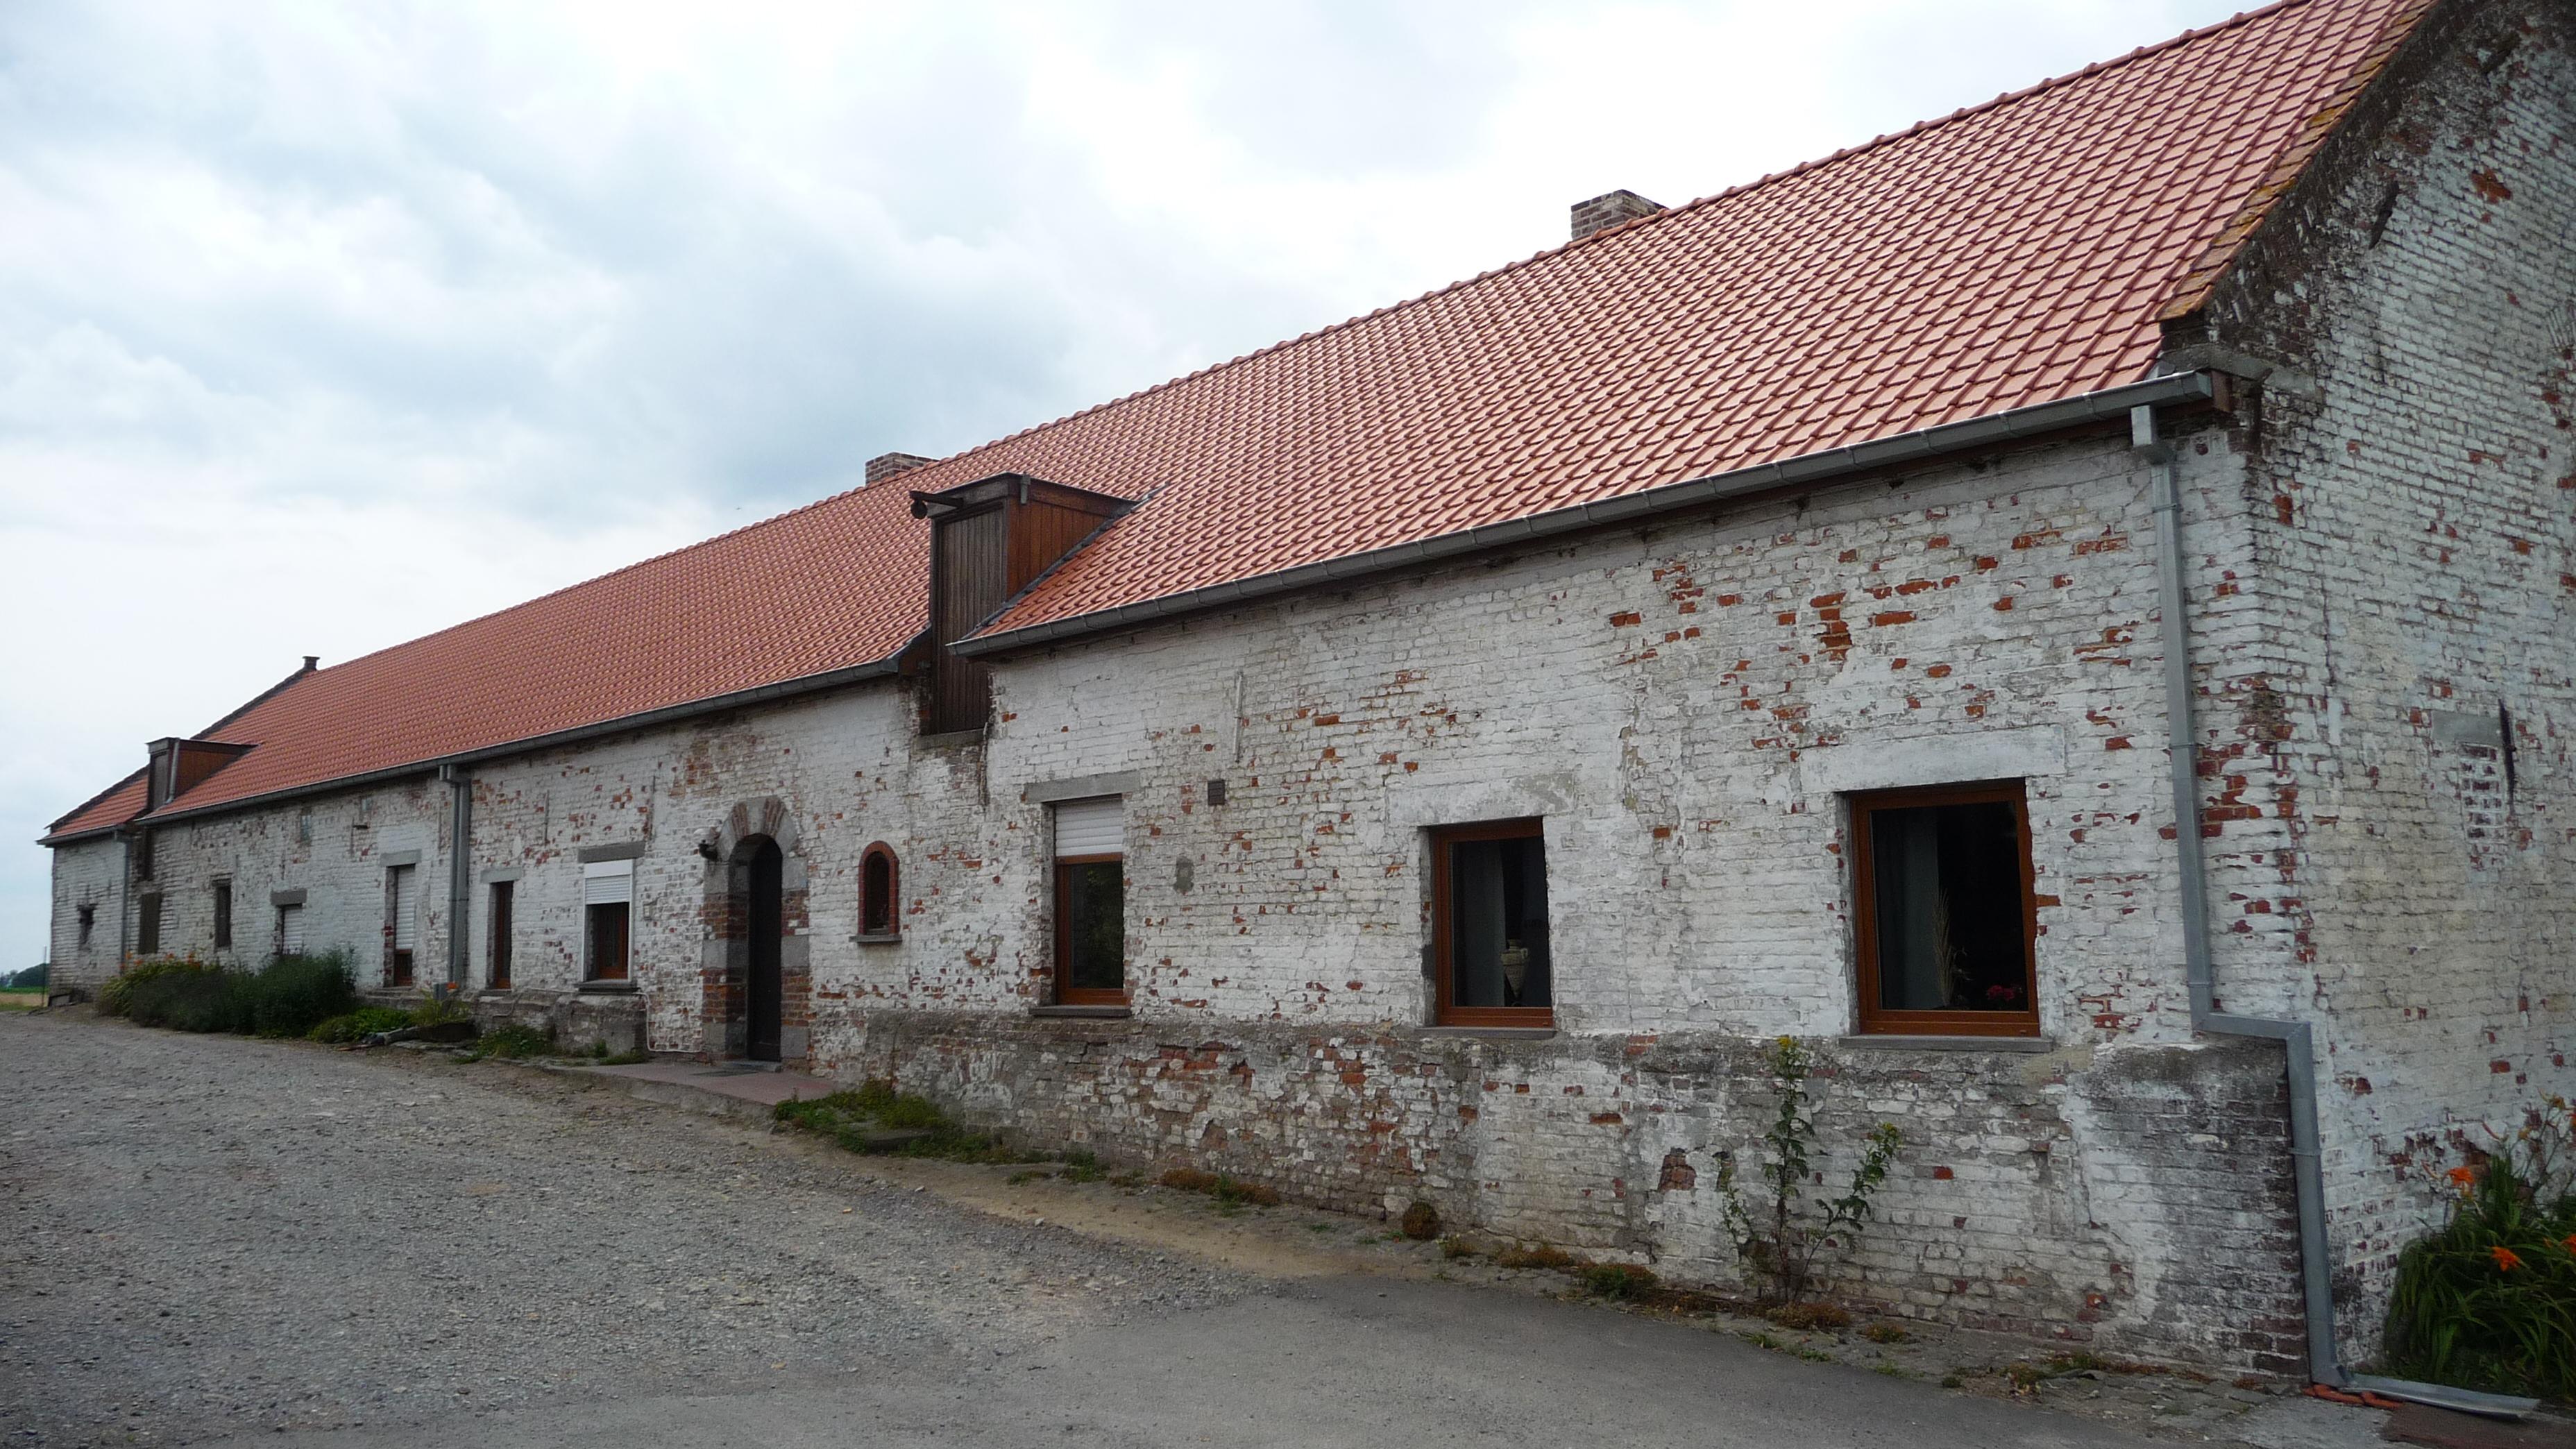 Farm in Frasnes-les-Anvaing